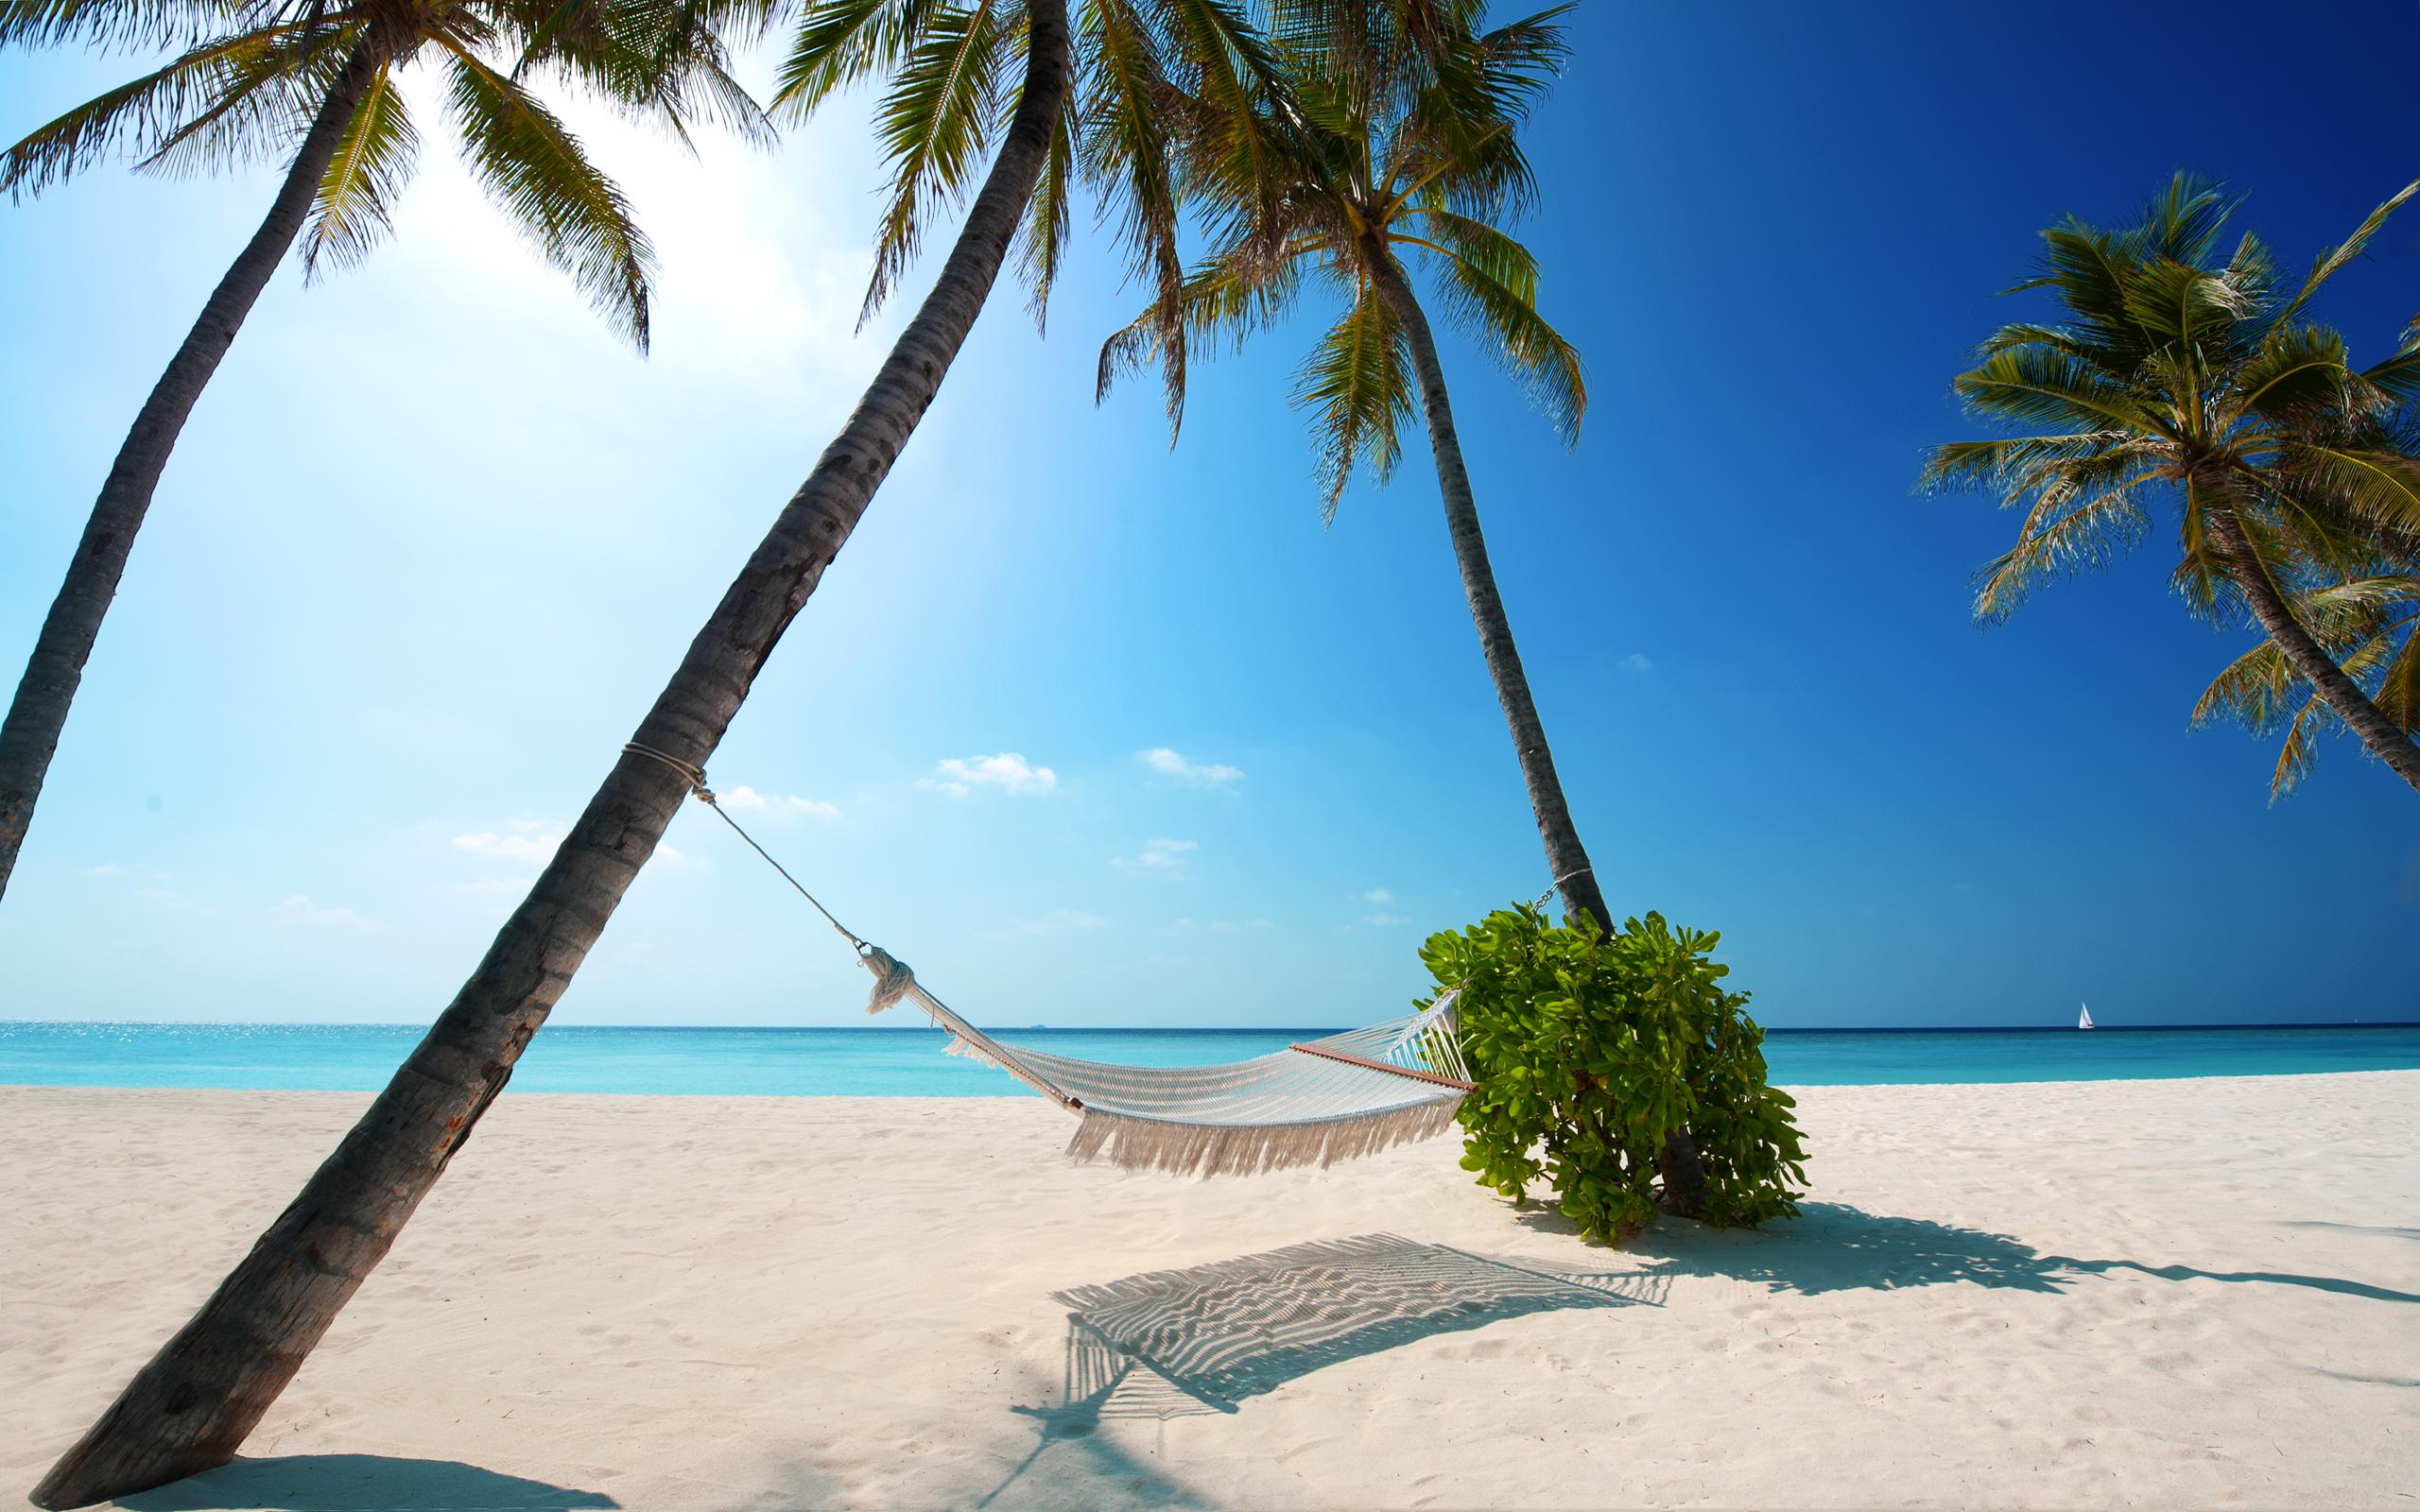 Playas tropicales - 2560x1600